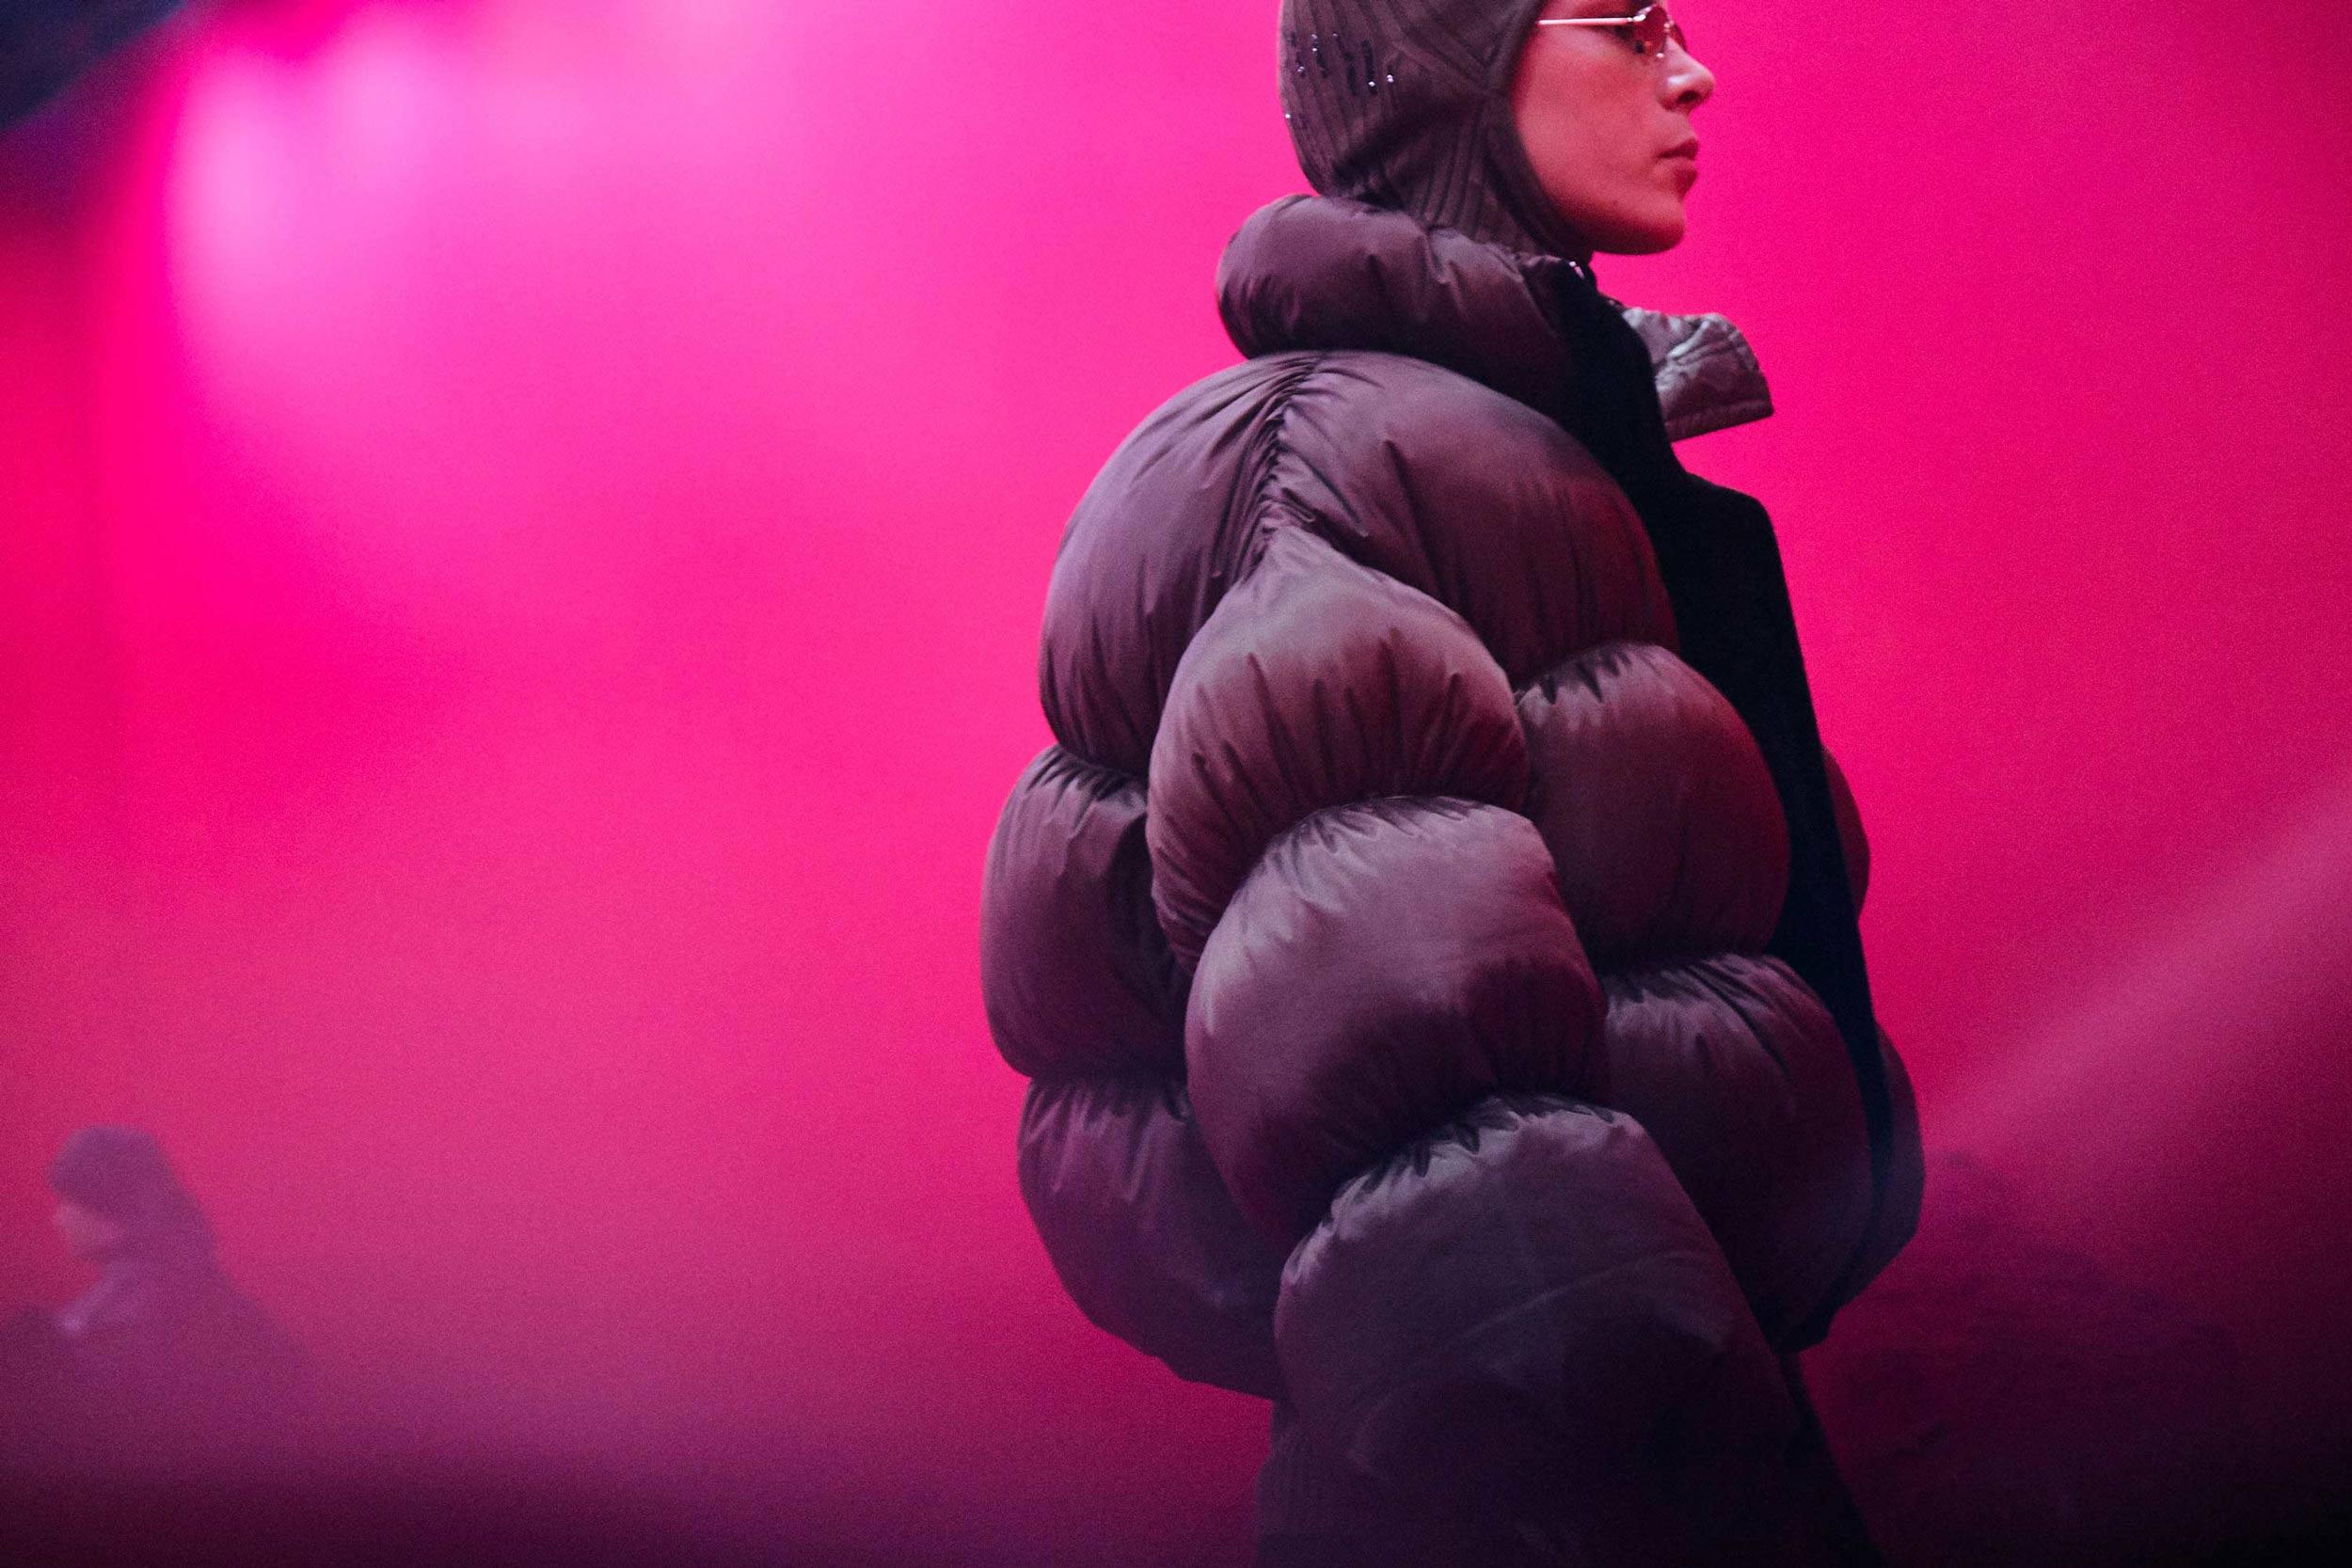 Goths, flower children, genderless punks: Moncler Genius is fashion's new first family